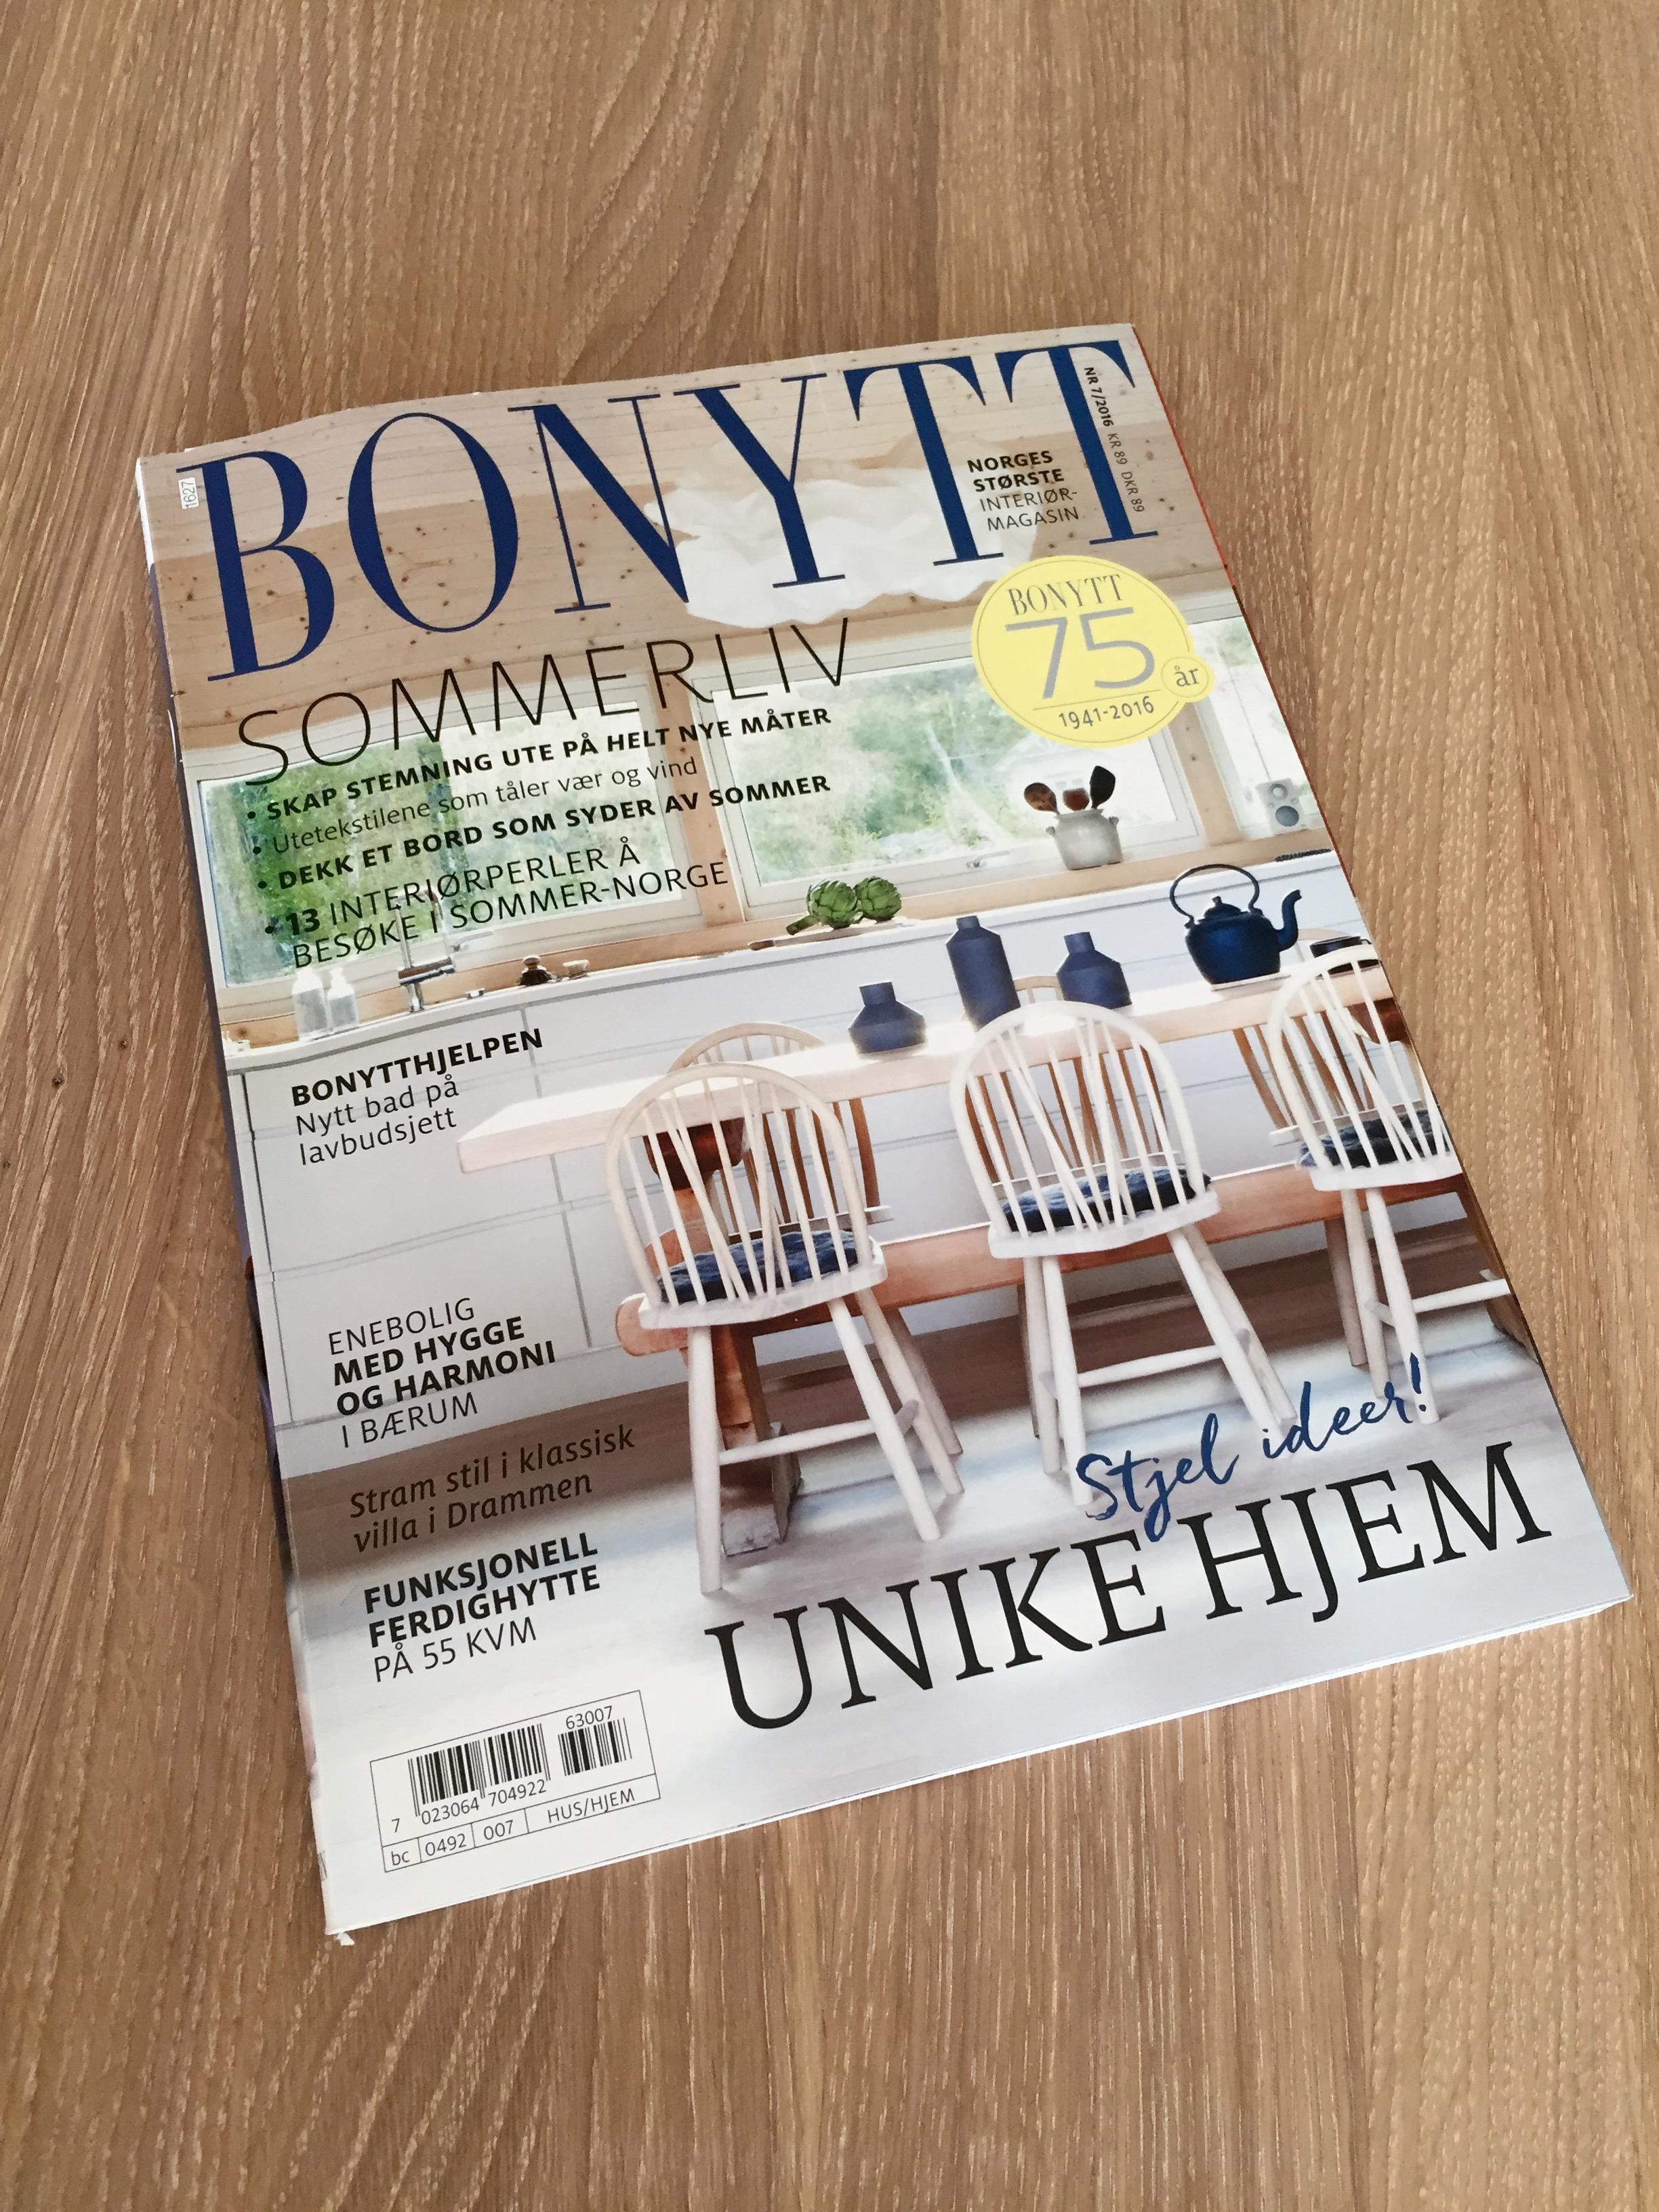 bonytt-juni-forside-madel-products